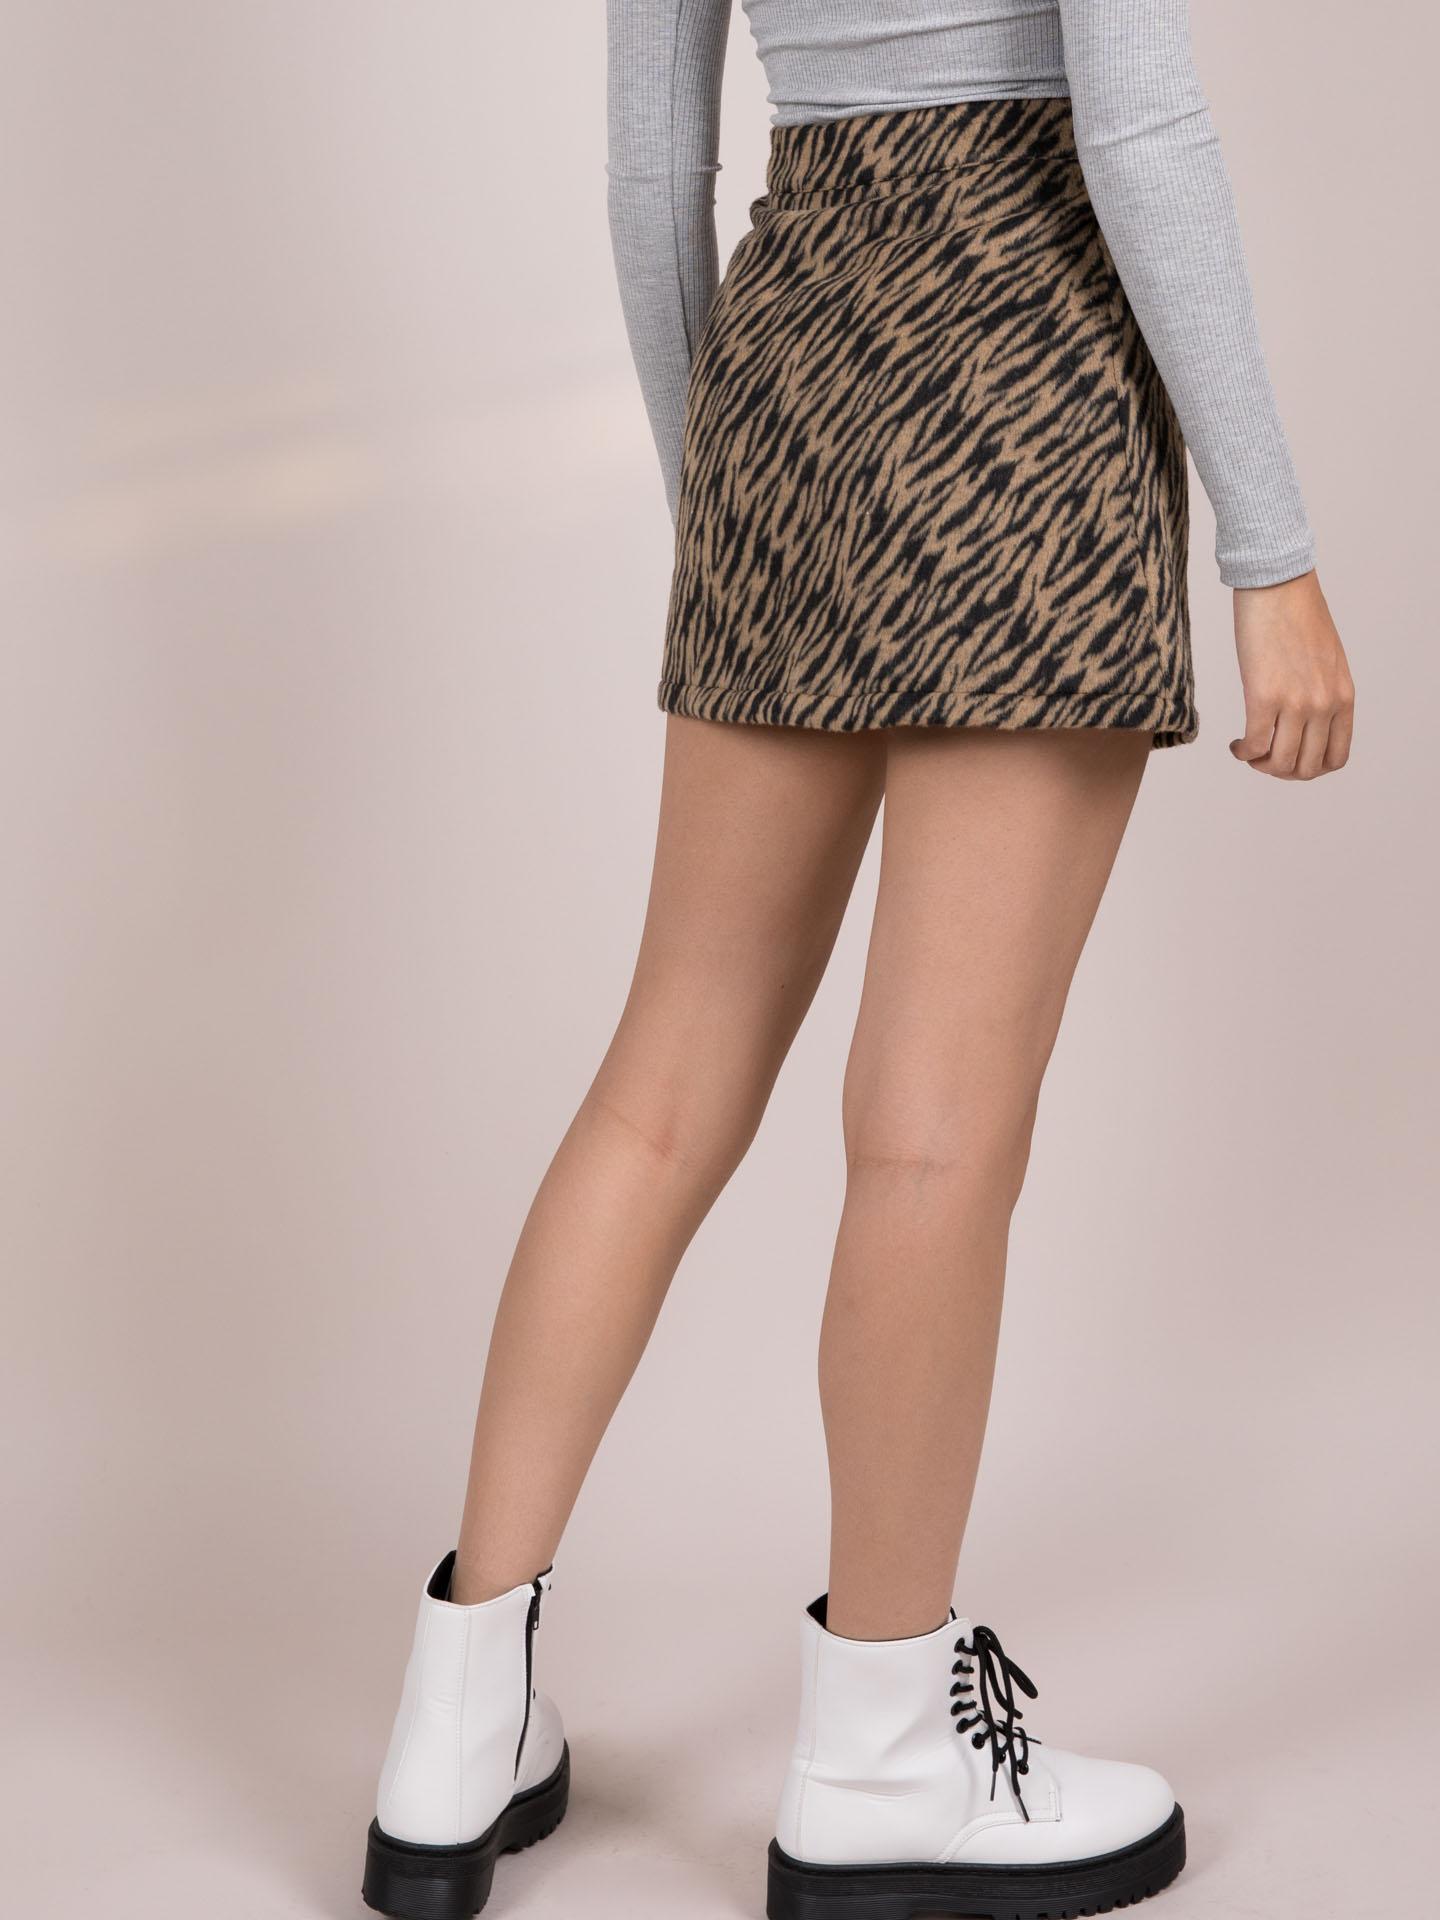 Suki Tiger Skirt Wool Zip Front Mini Back